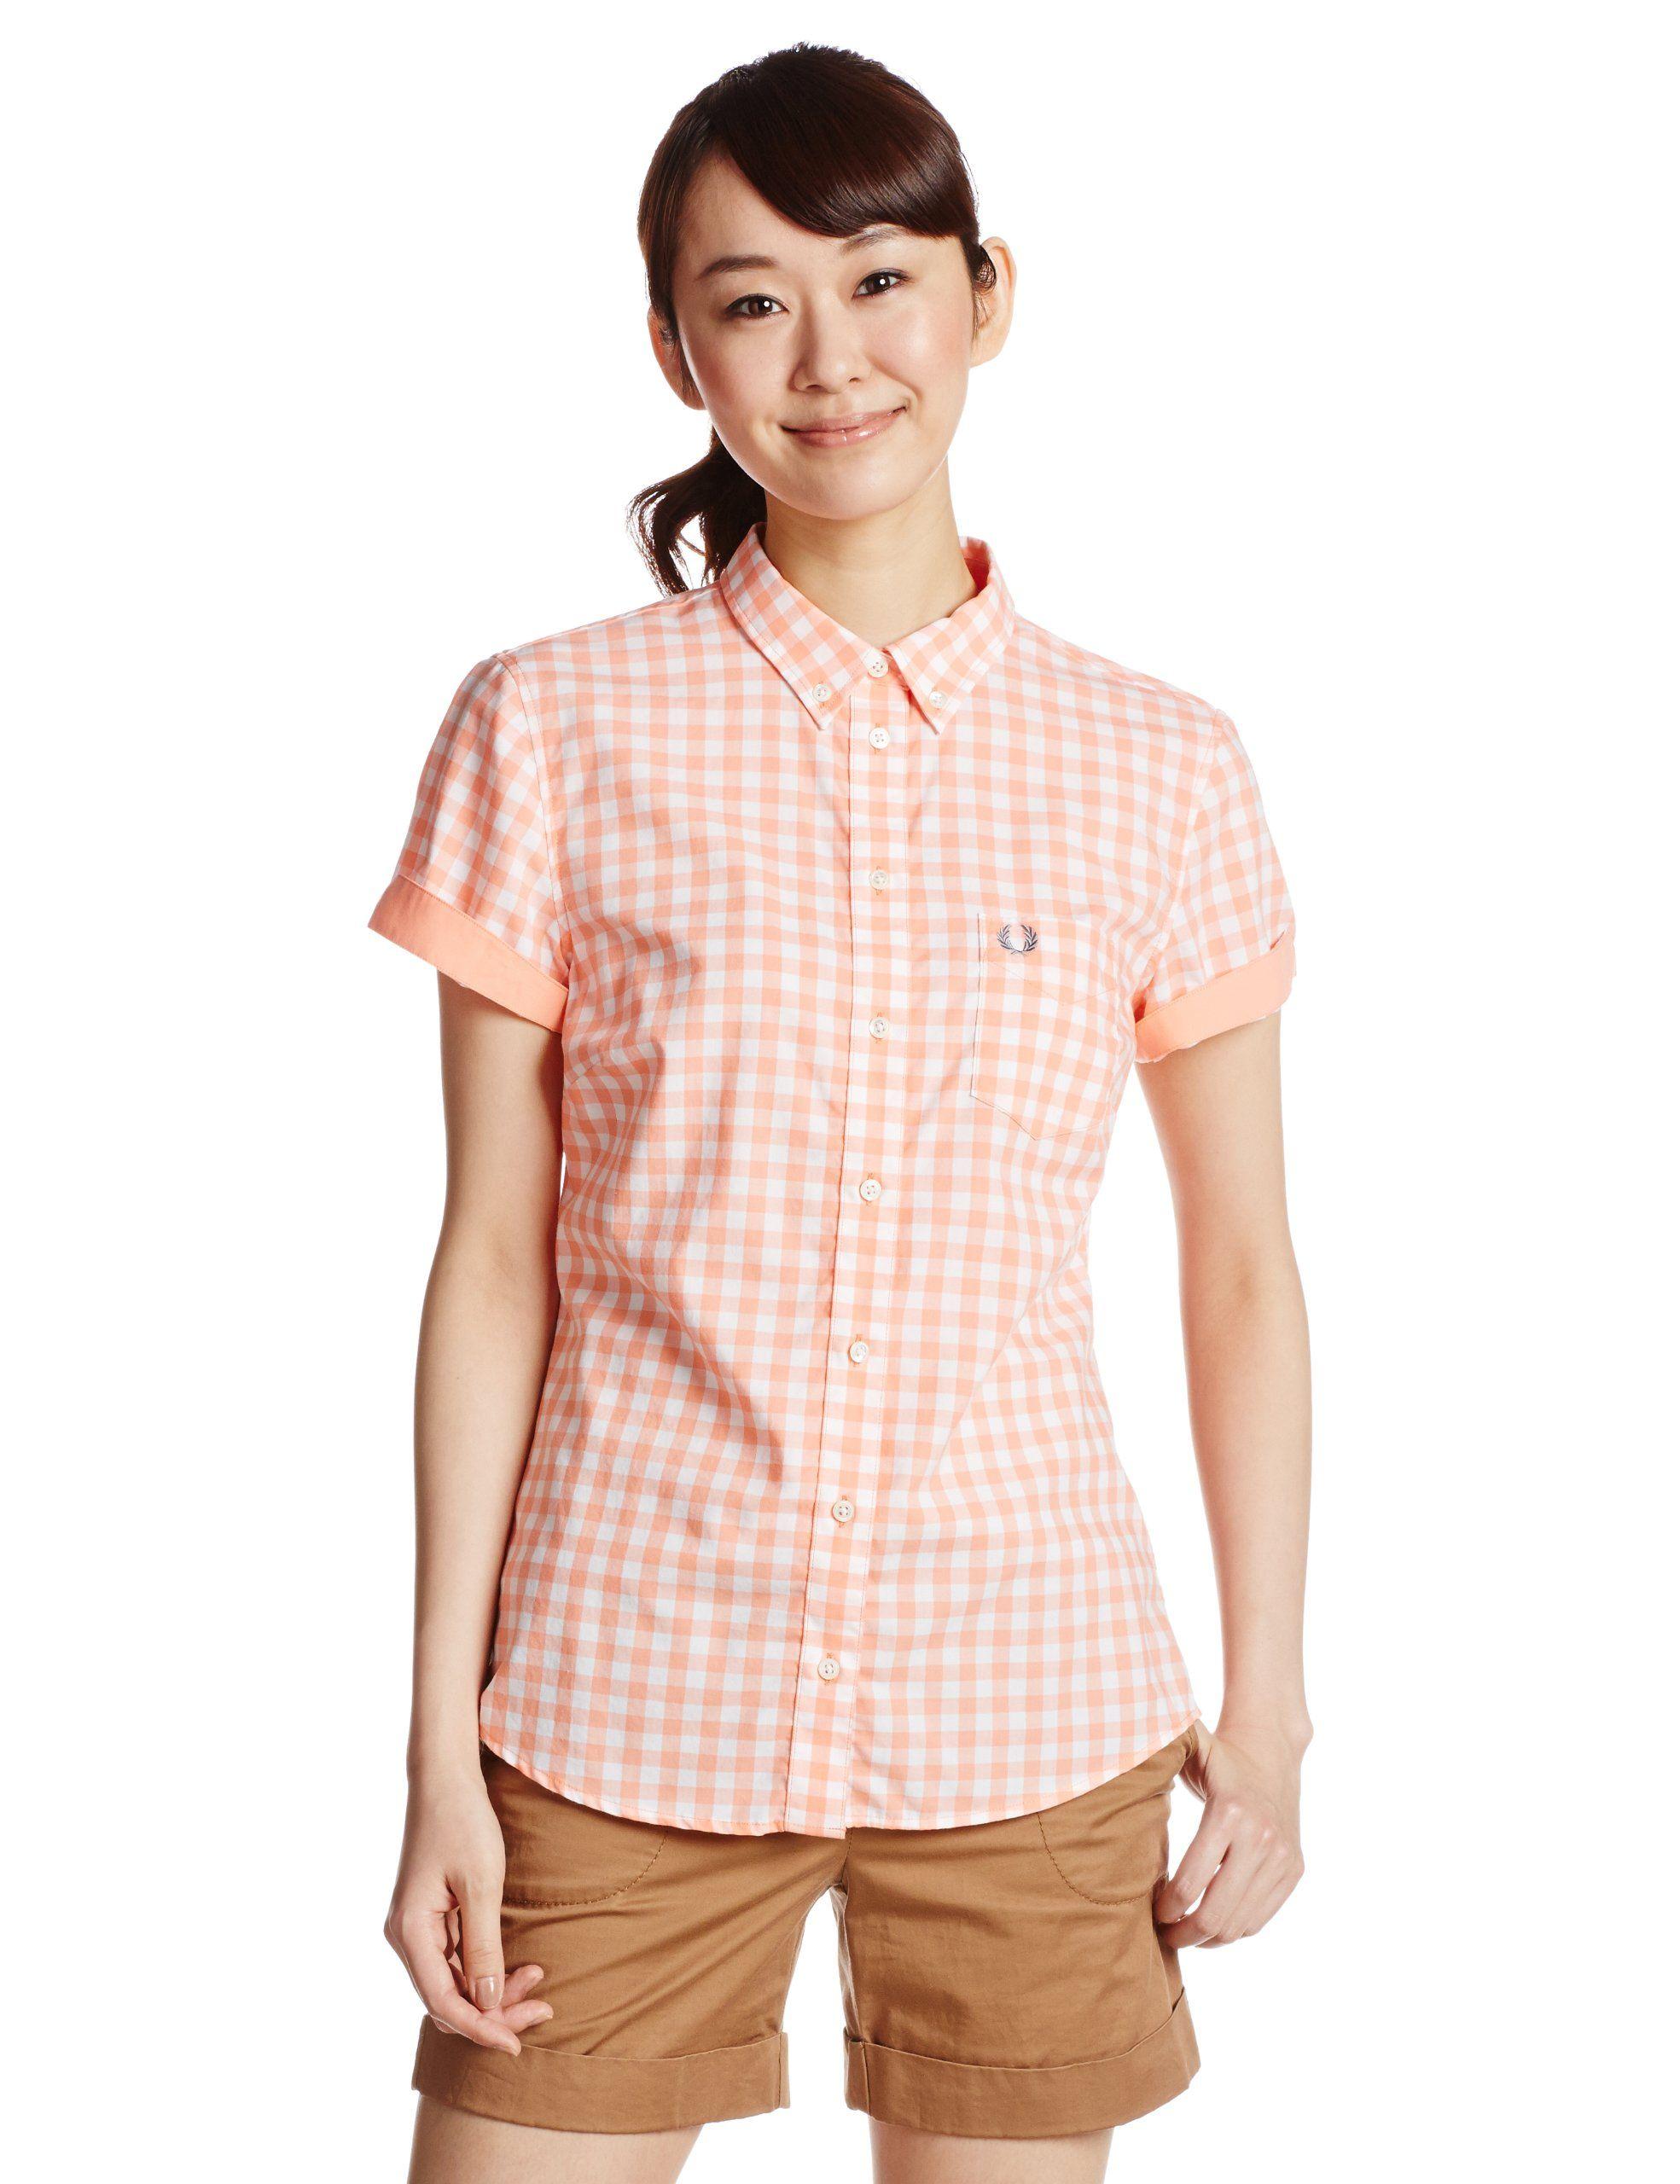 Amazon.co.jp: (フレッドペリー)FRED PERRY Classic Slim Fit Gingham Shirt: 服&ファッション小物  (via http://www.amazon.co.jp/gp/product/B00BP4UA1E/ref=pe_1021872_166761152_pe_epc__1p_0_ti )